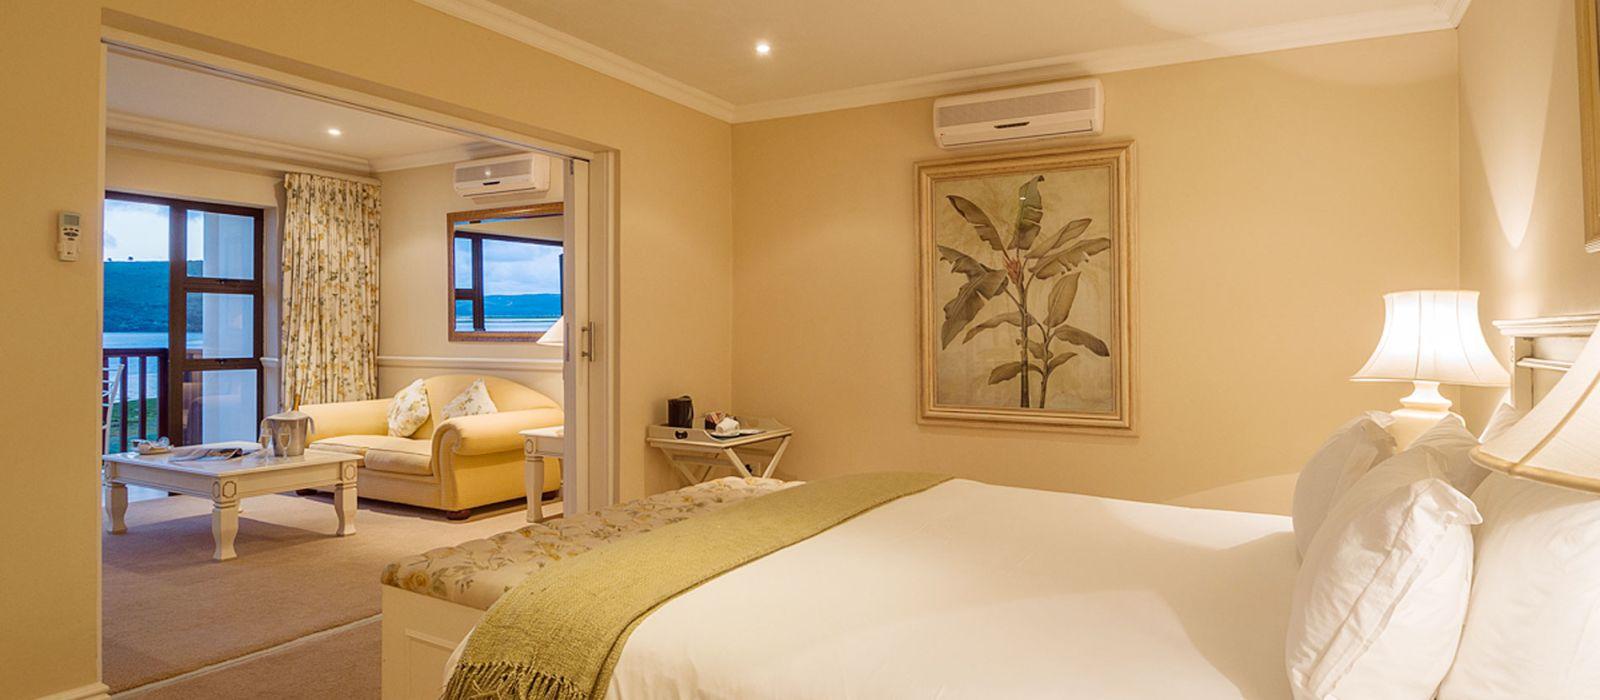 Hotel St. James of Knysna South Africa